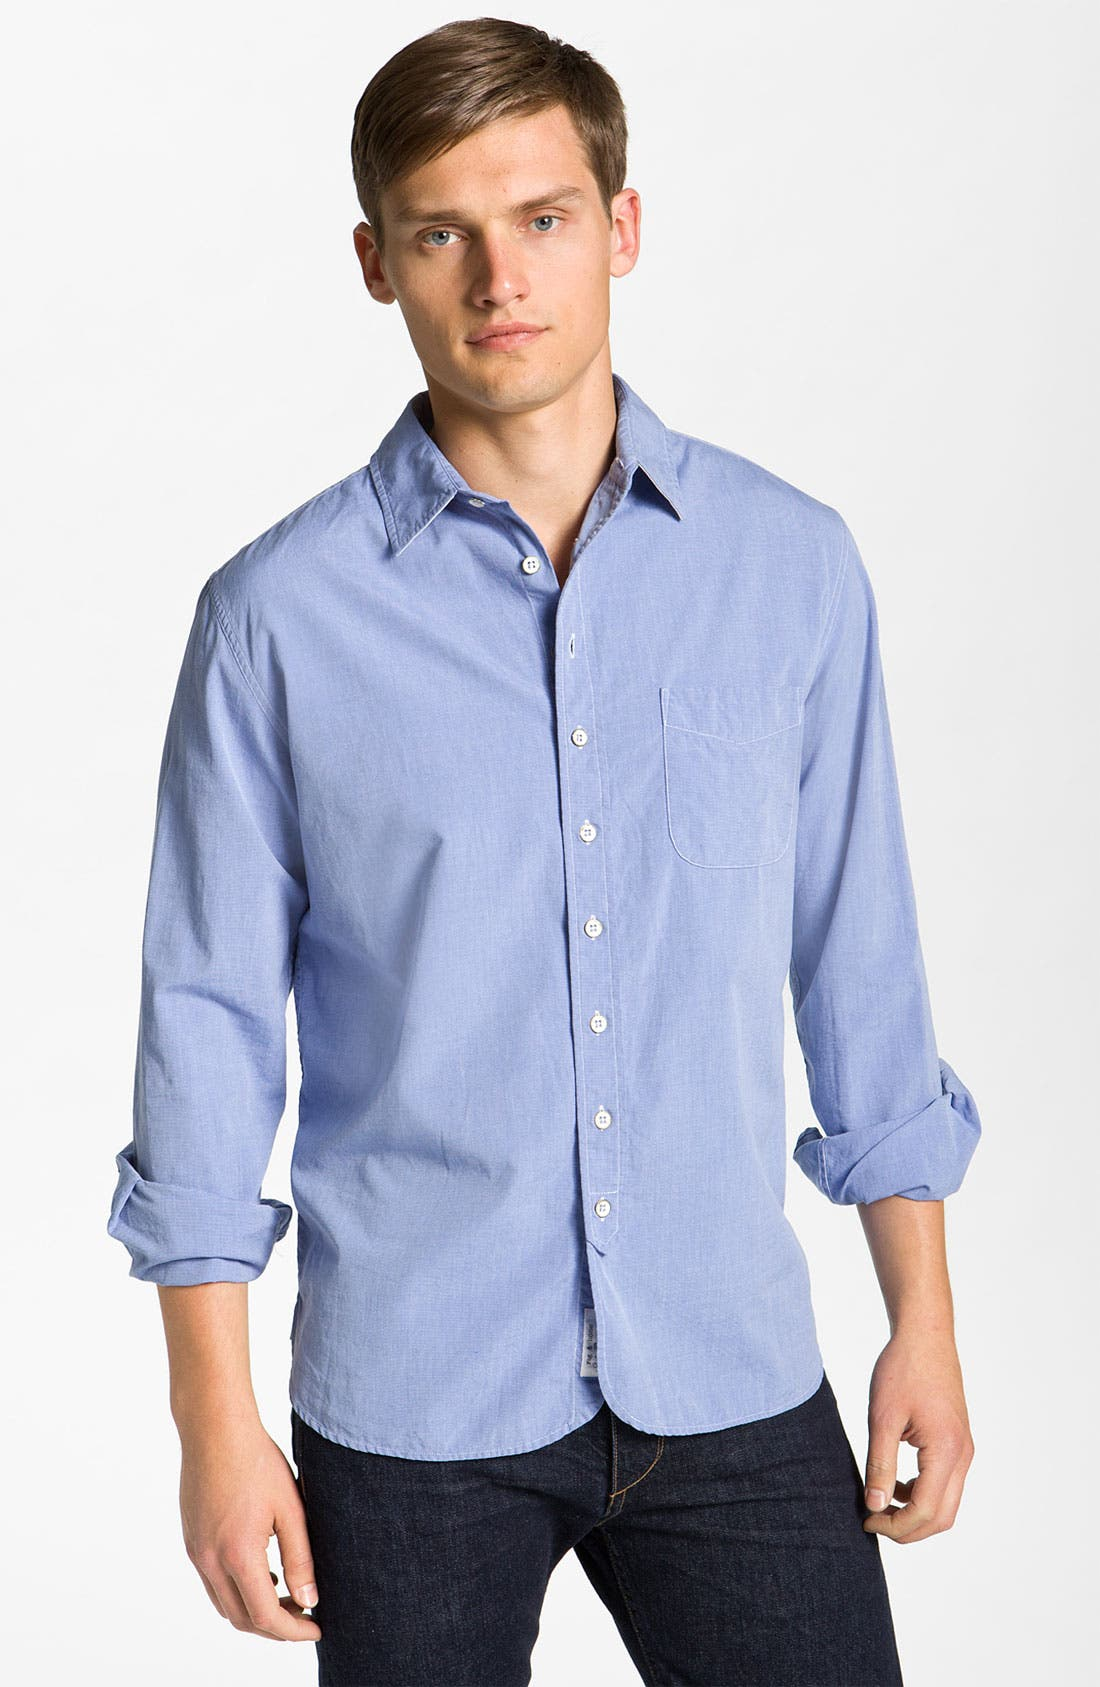 Alternate Image 1 Selected - rag & bone Washed Cotton Sport Shirt